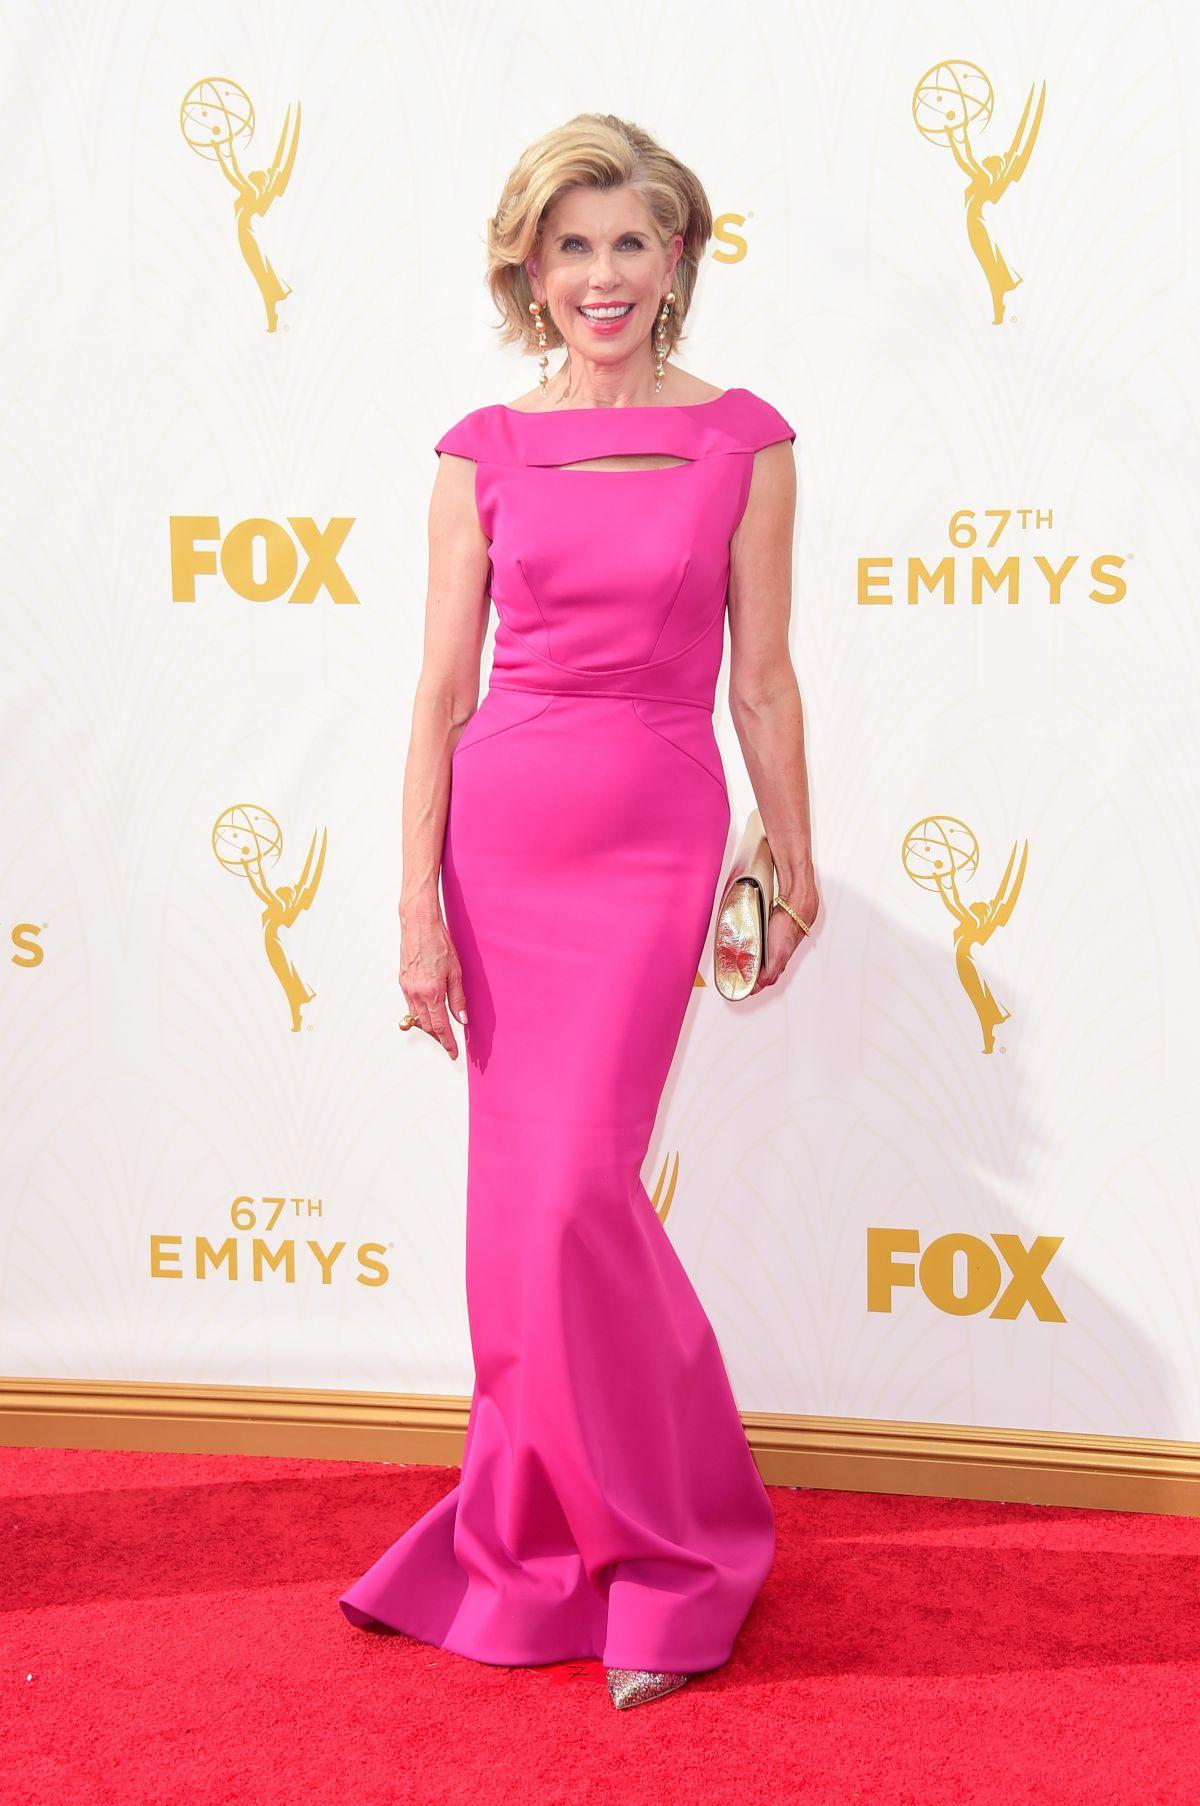 CHRISTINE BARANSKI at 2015 Emmy Awards in Los Angeles 09/20/2015